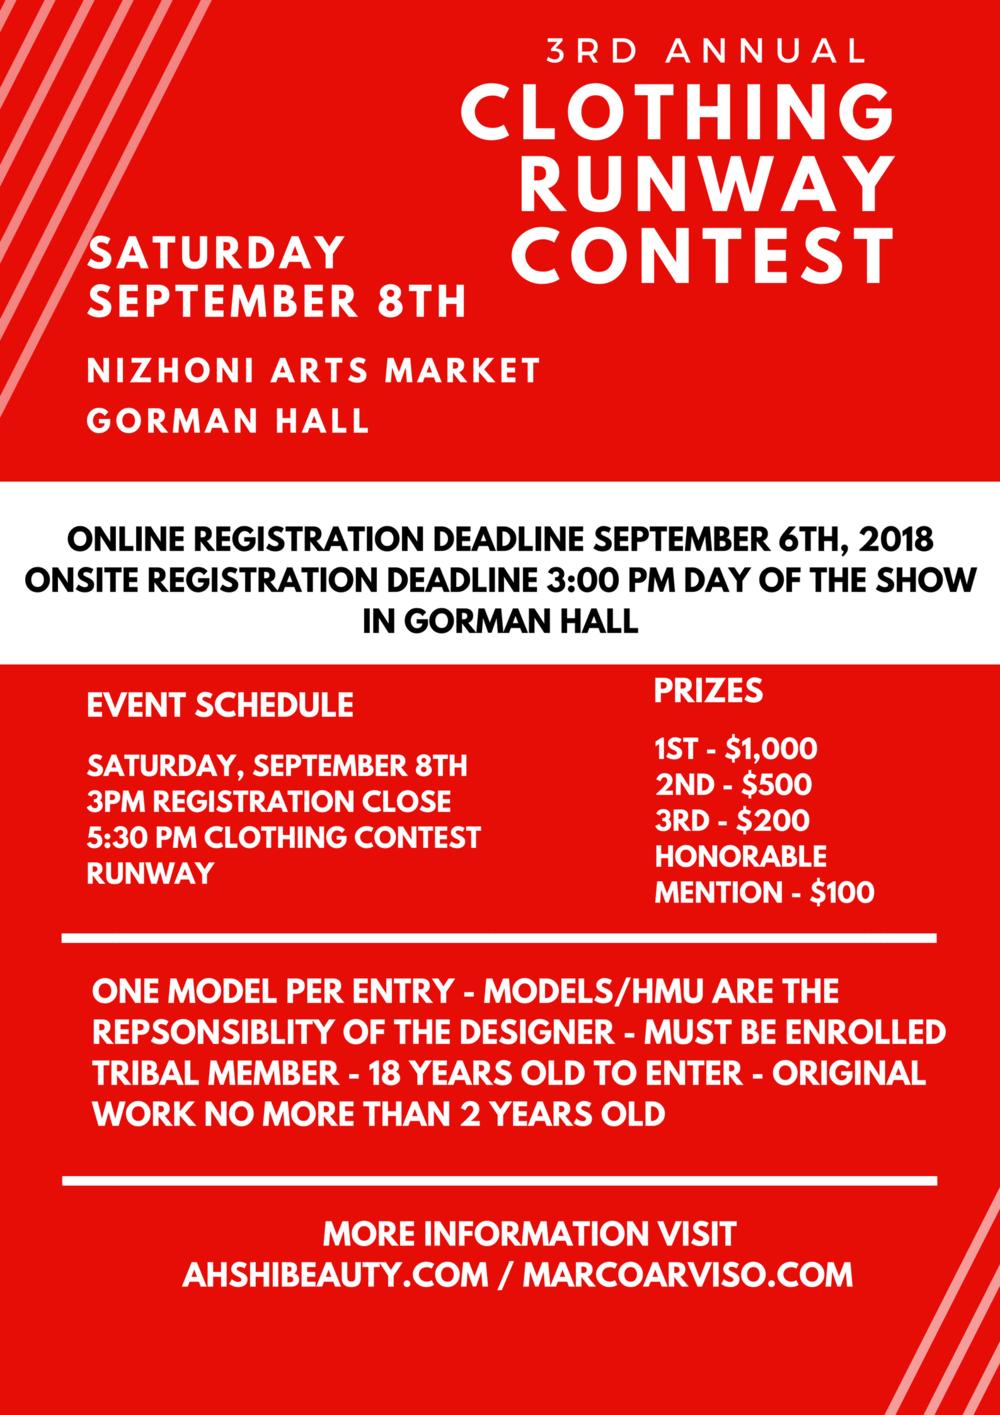 3rd Annual Clothing Contest - navajo Nation Fashion Showcase